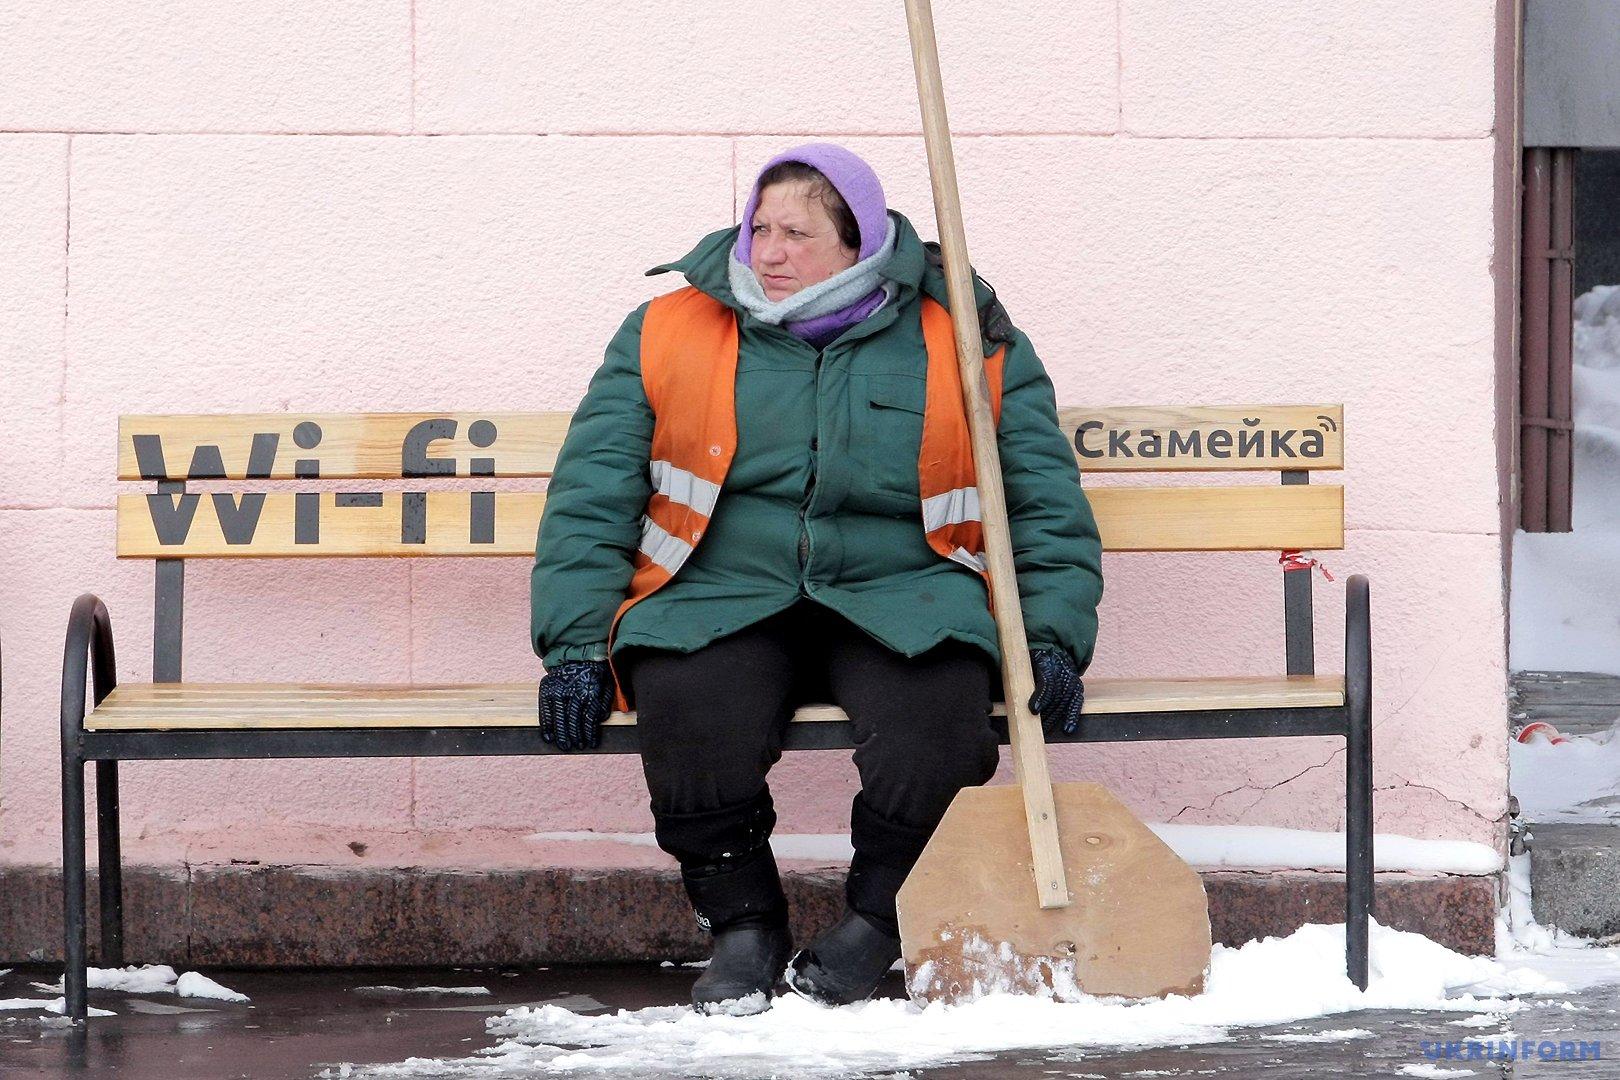 Уборка снега в Харькове / Фото: Мадиевский Вячеслав. Укринформ